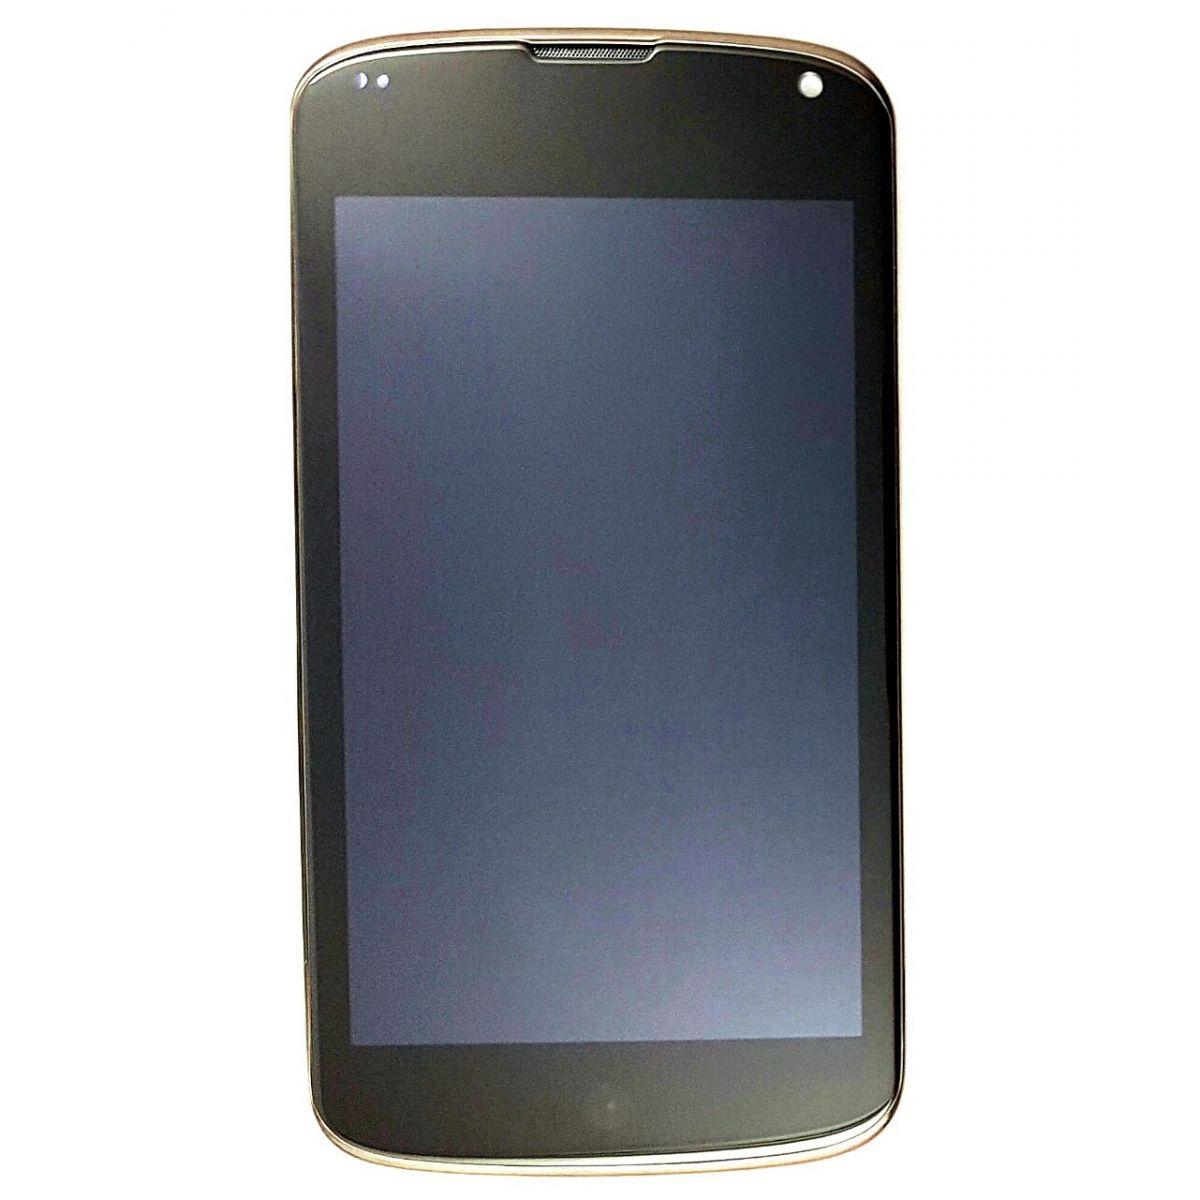 Display Frontal LG Nexus 4 E960 Preto com Aro